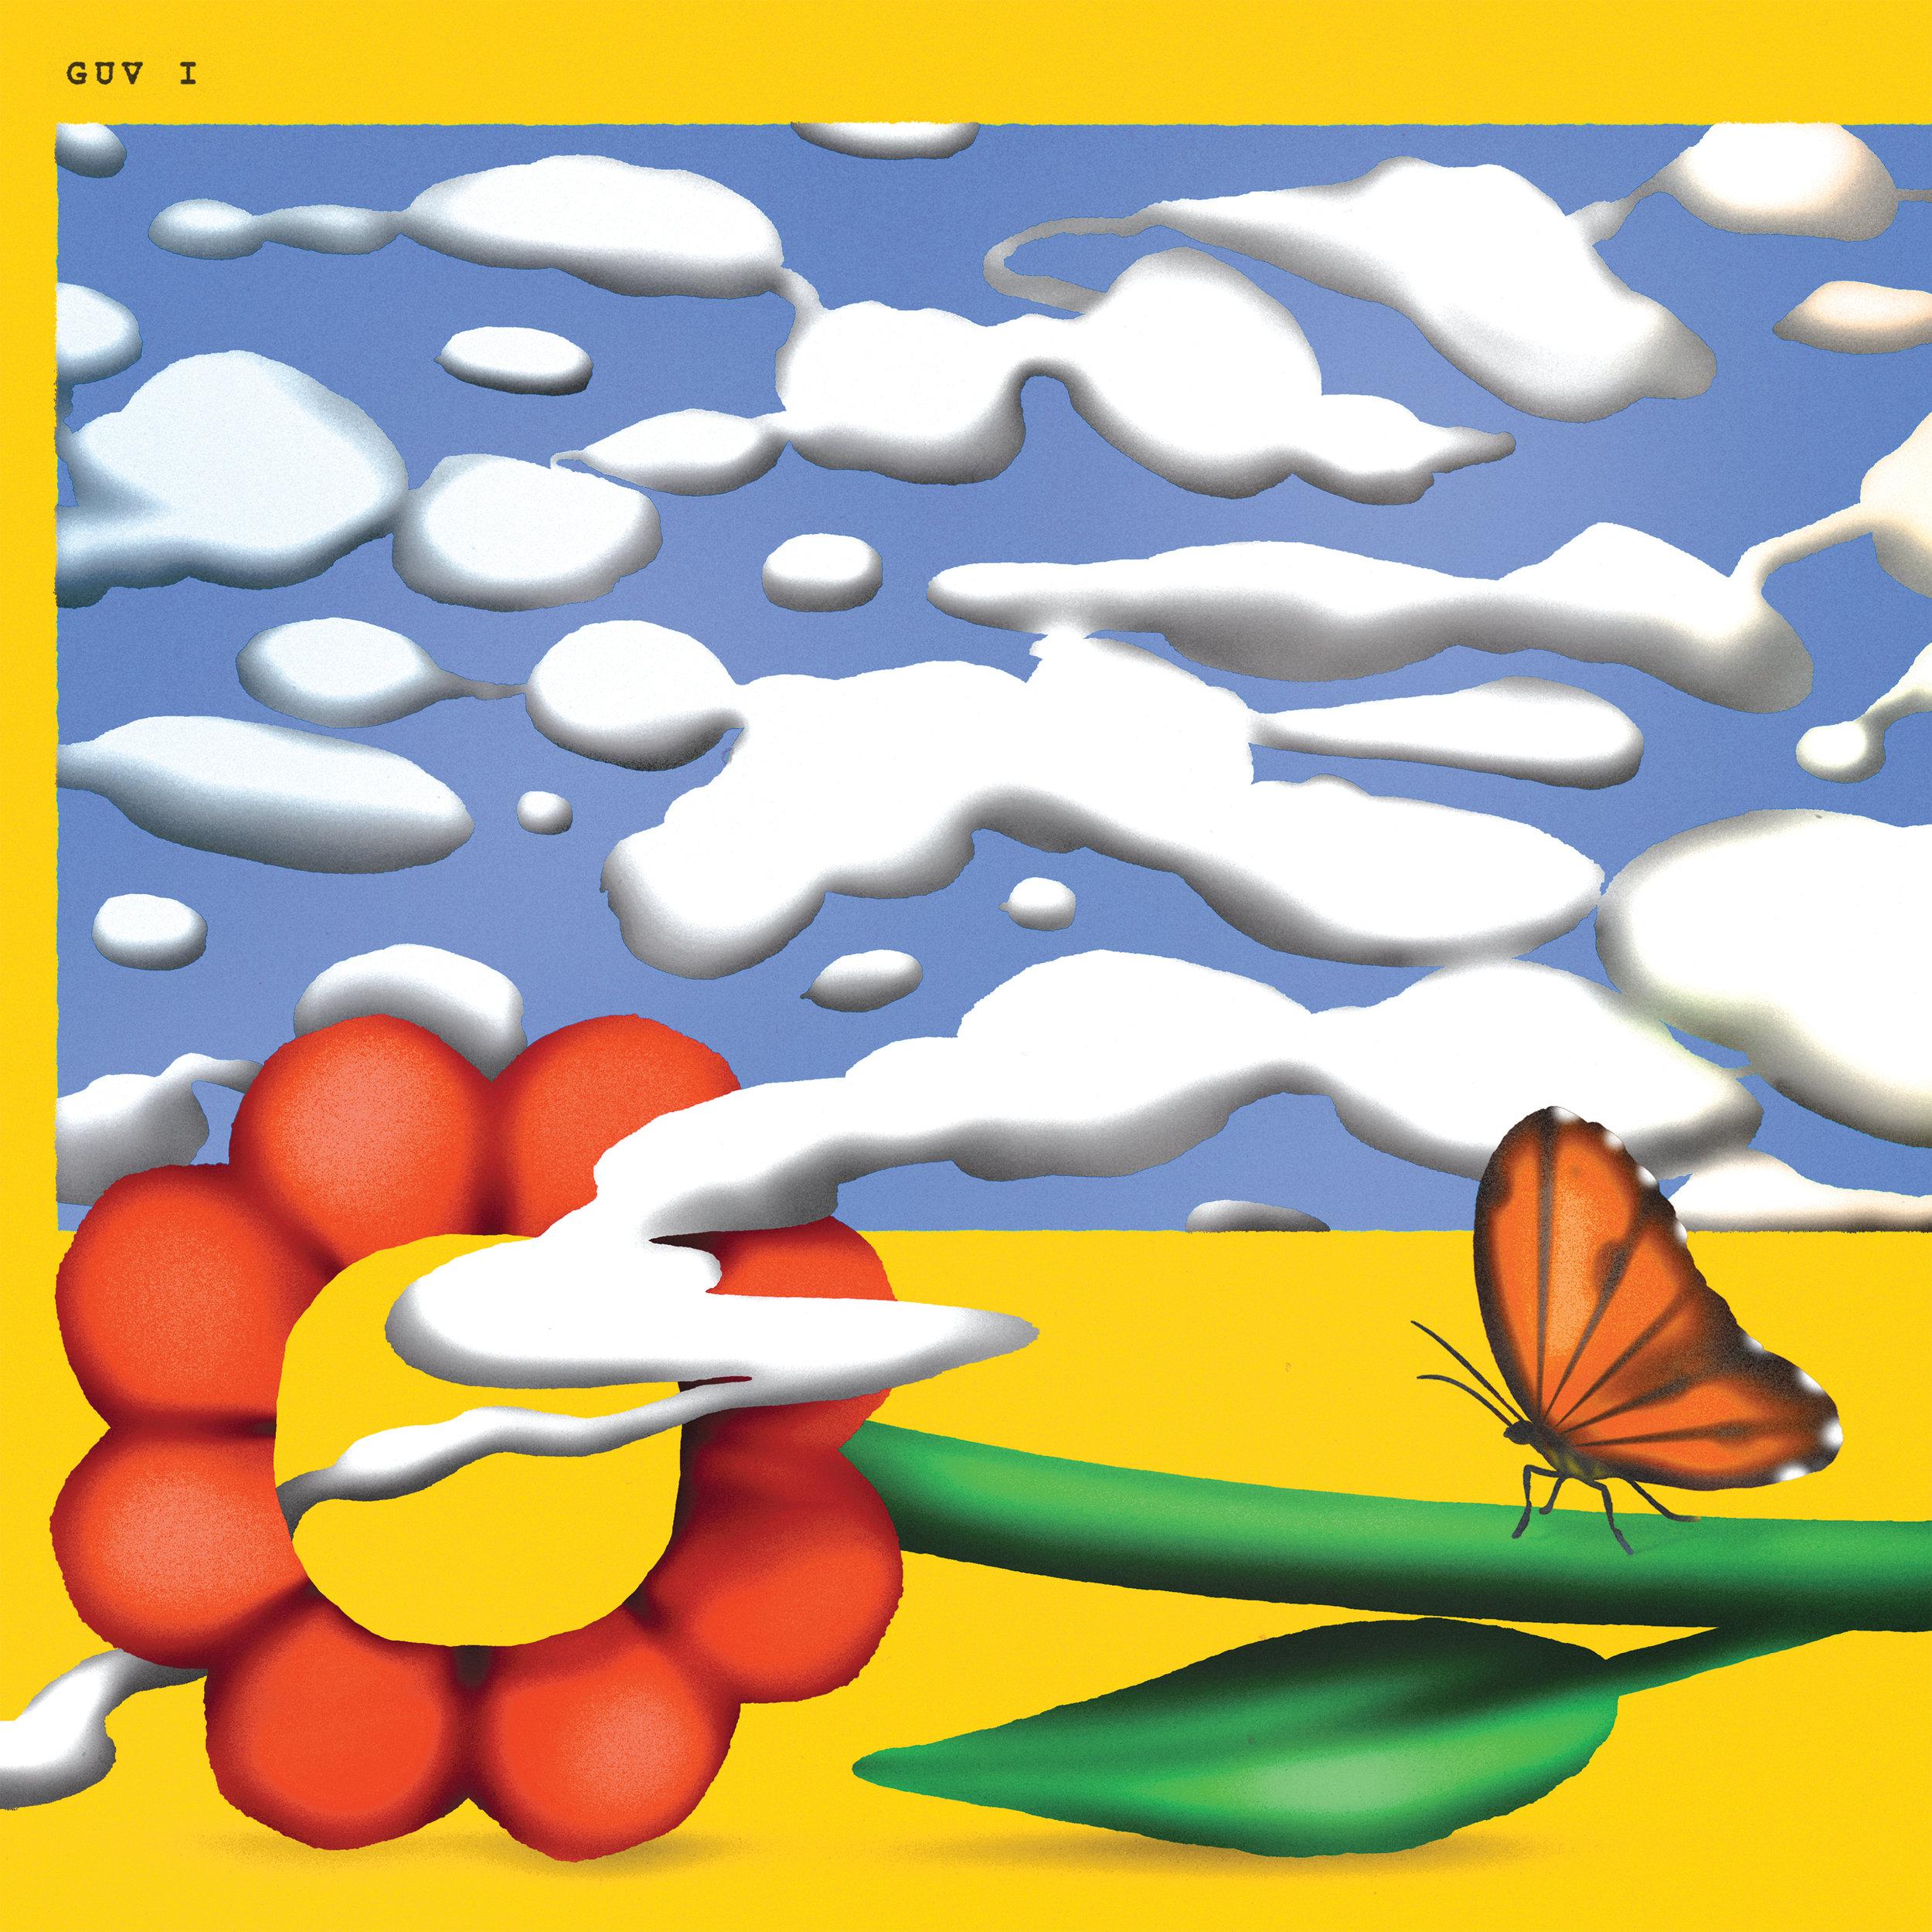 GUVI-3600x3600_RGB.jpg